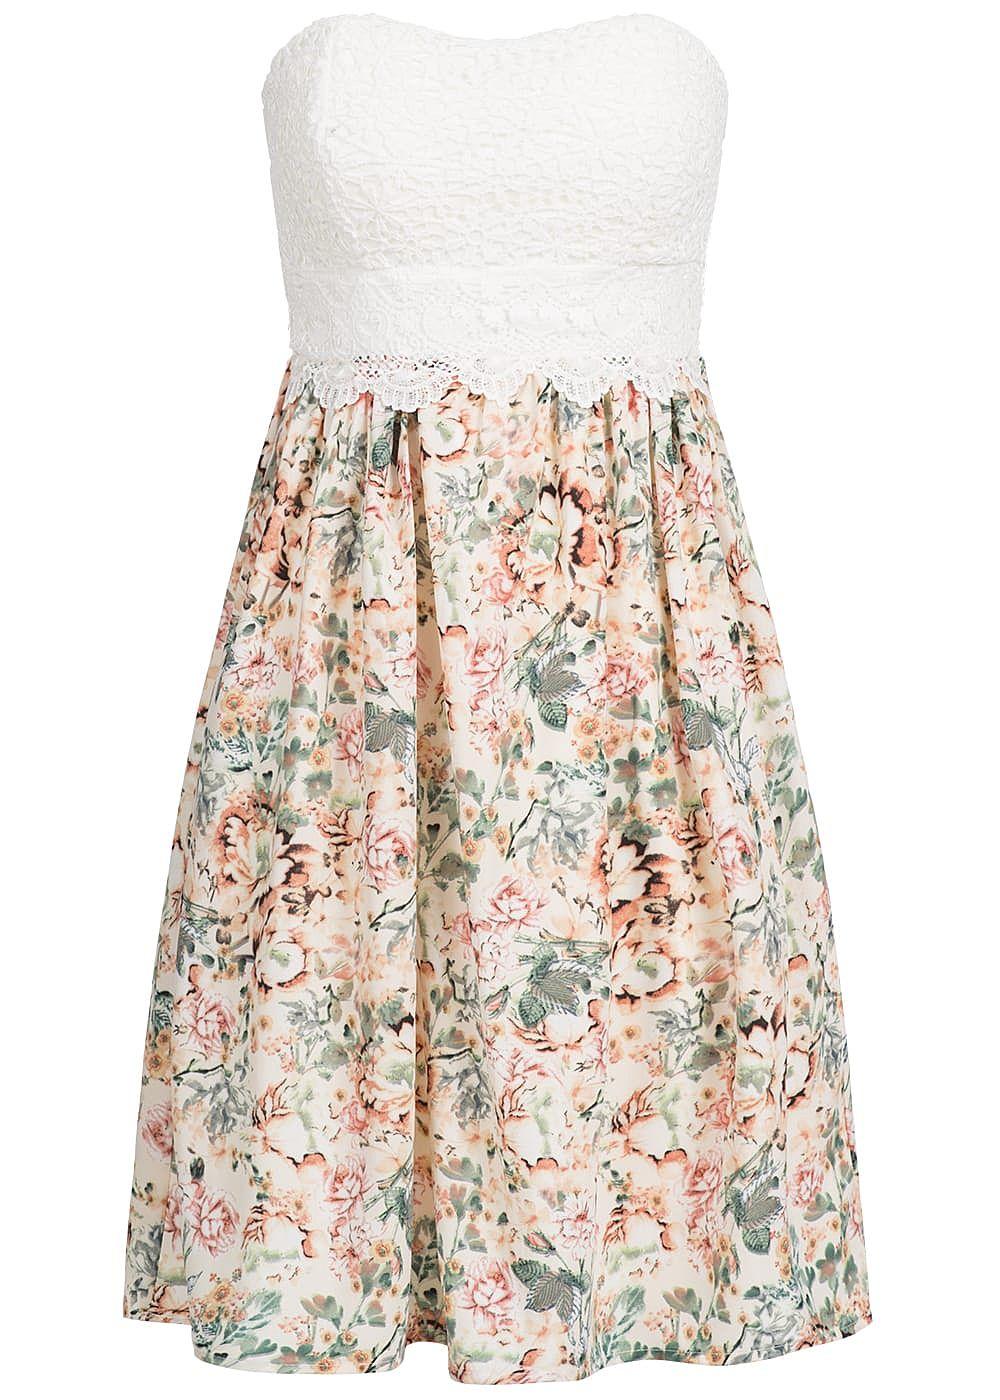 Seventyseven Lifestyle Damen Bandeau Kleid Häkeloptik Blumen